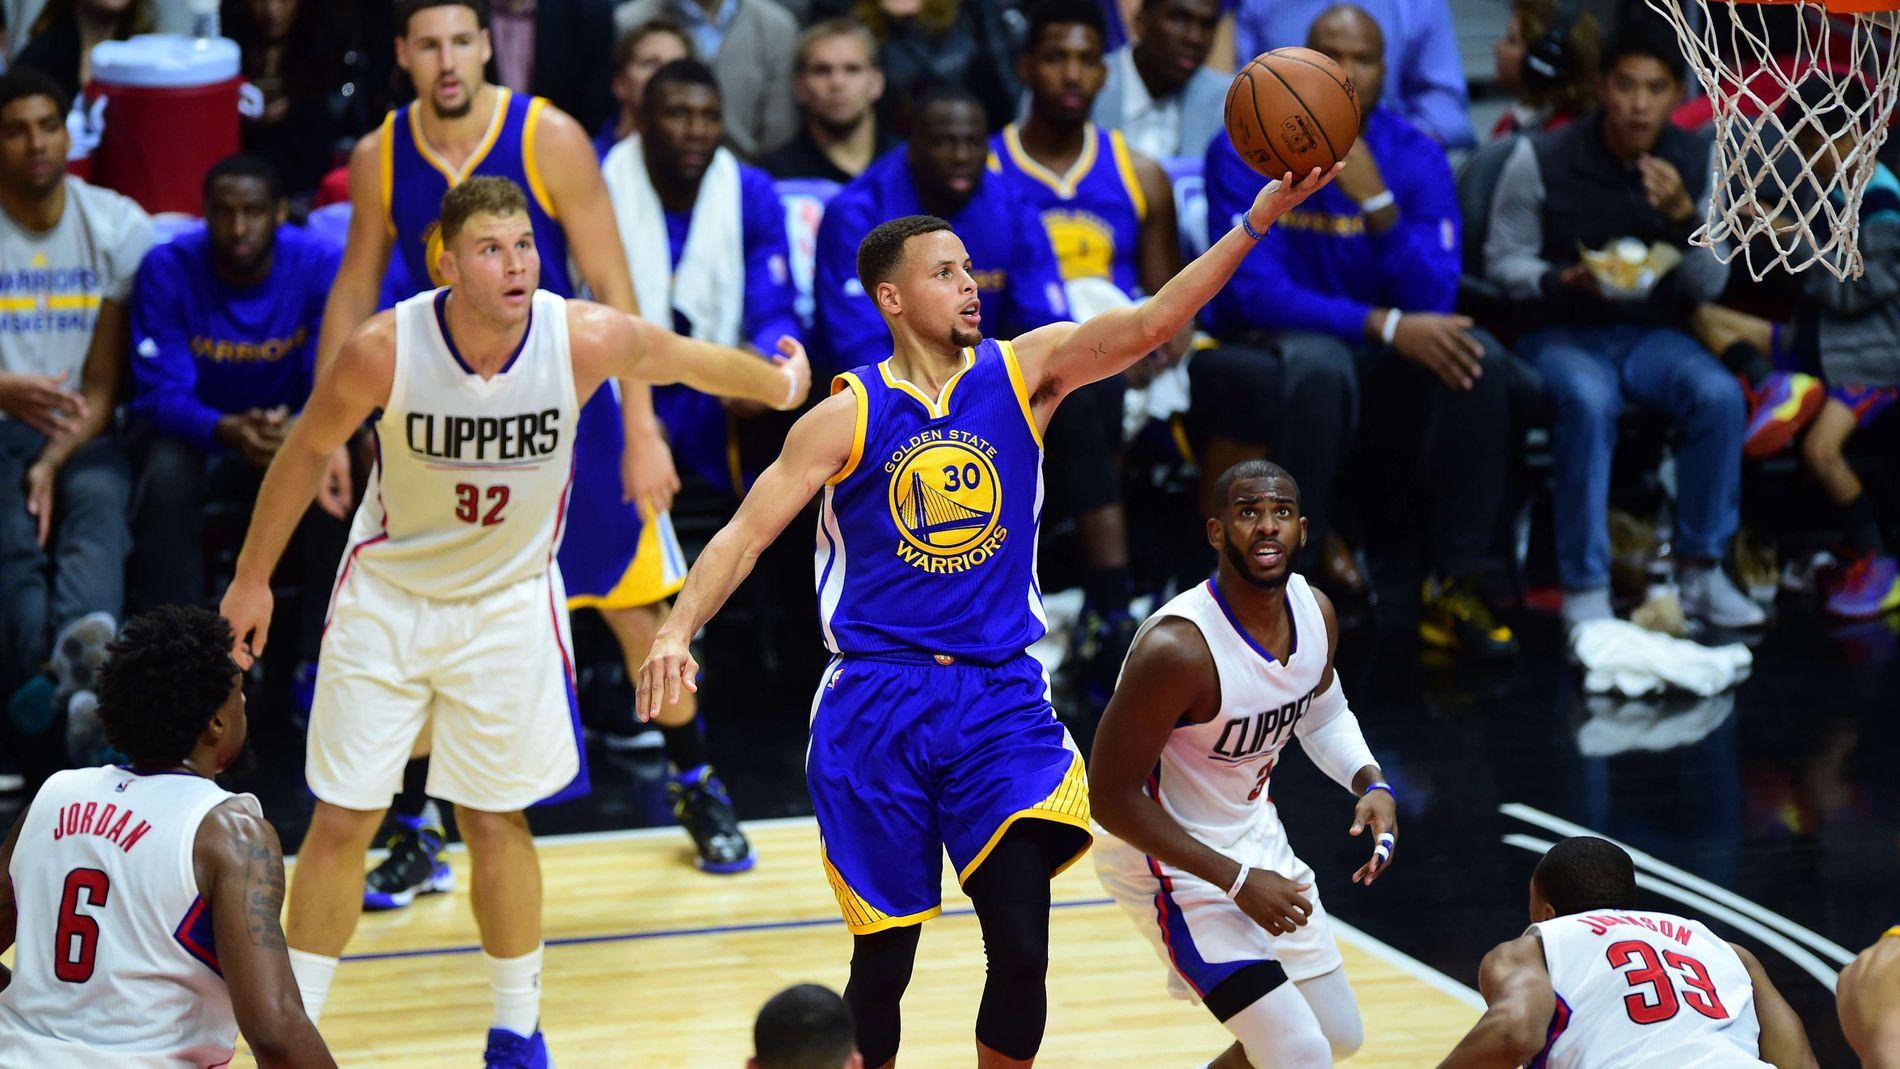 new product e6e04 5a4dc Milliard-kontrakt sikrer Curry tidenes mest verdifulle NBA-avtale